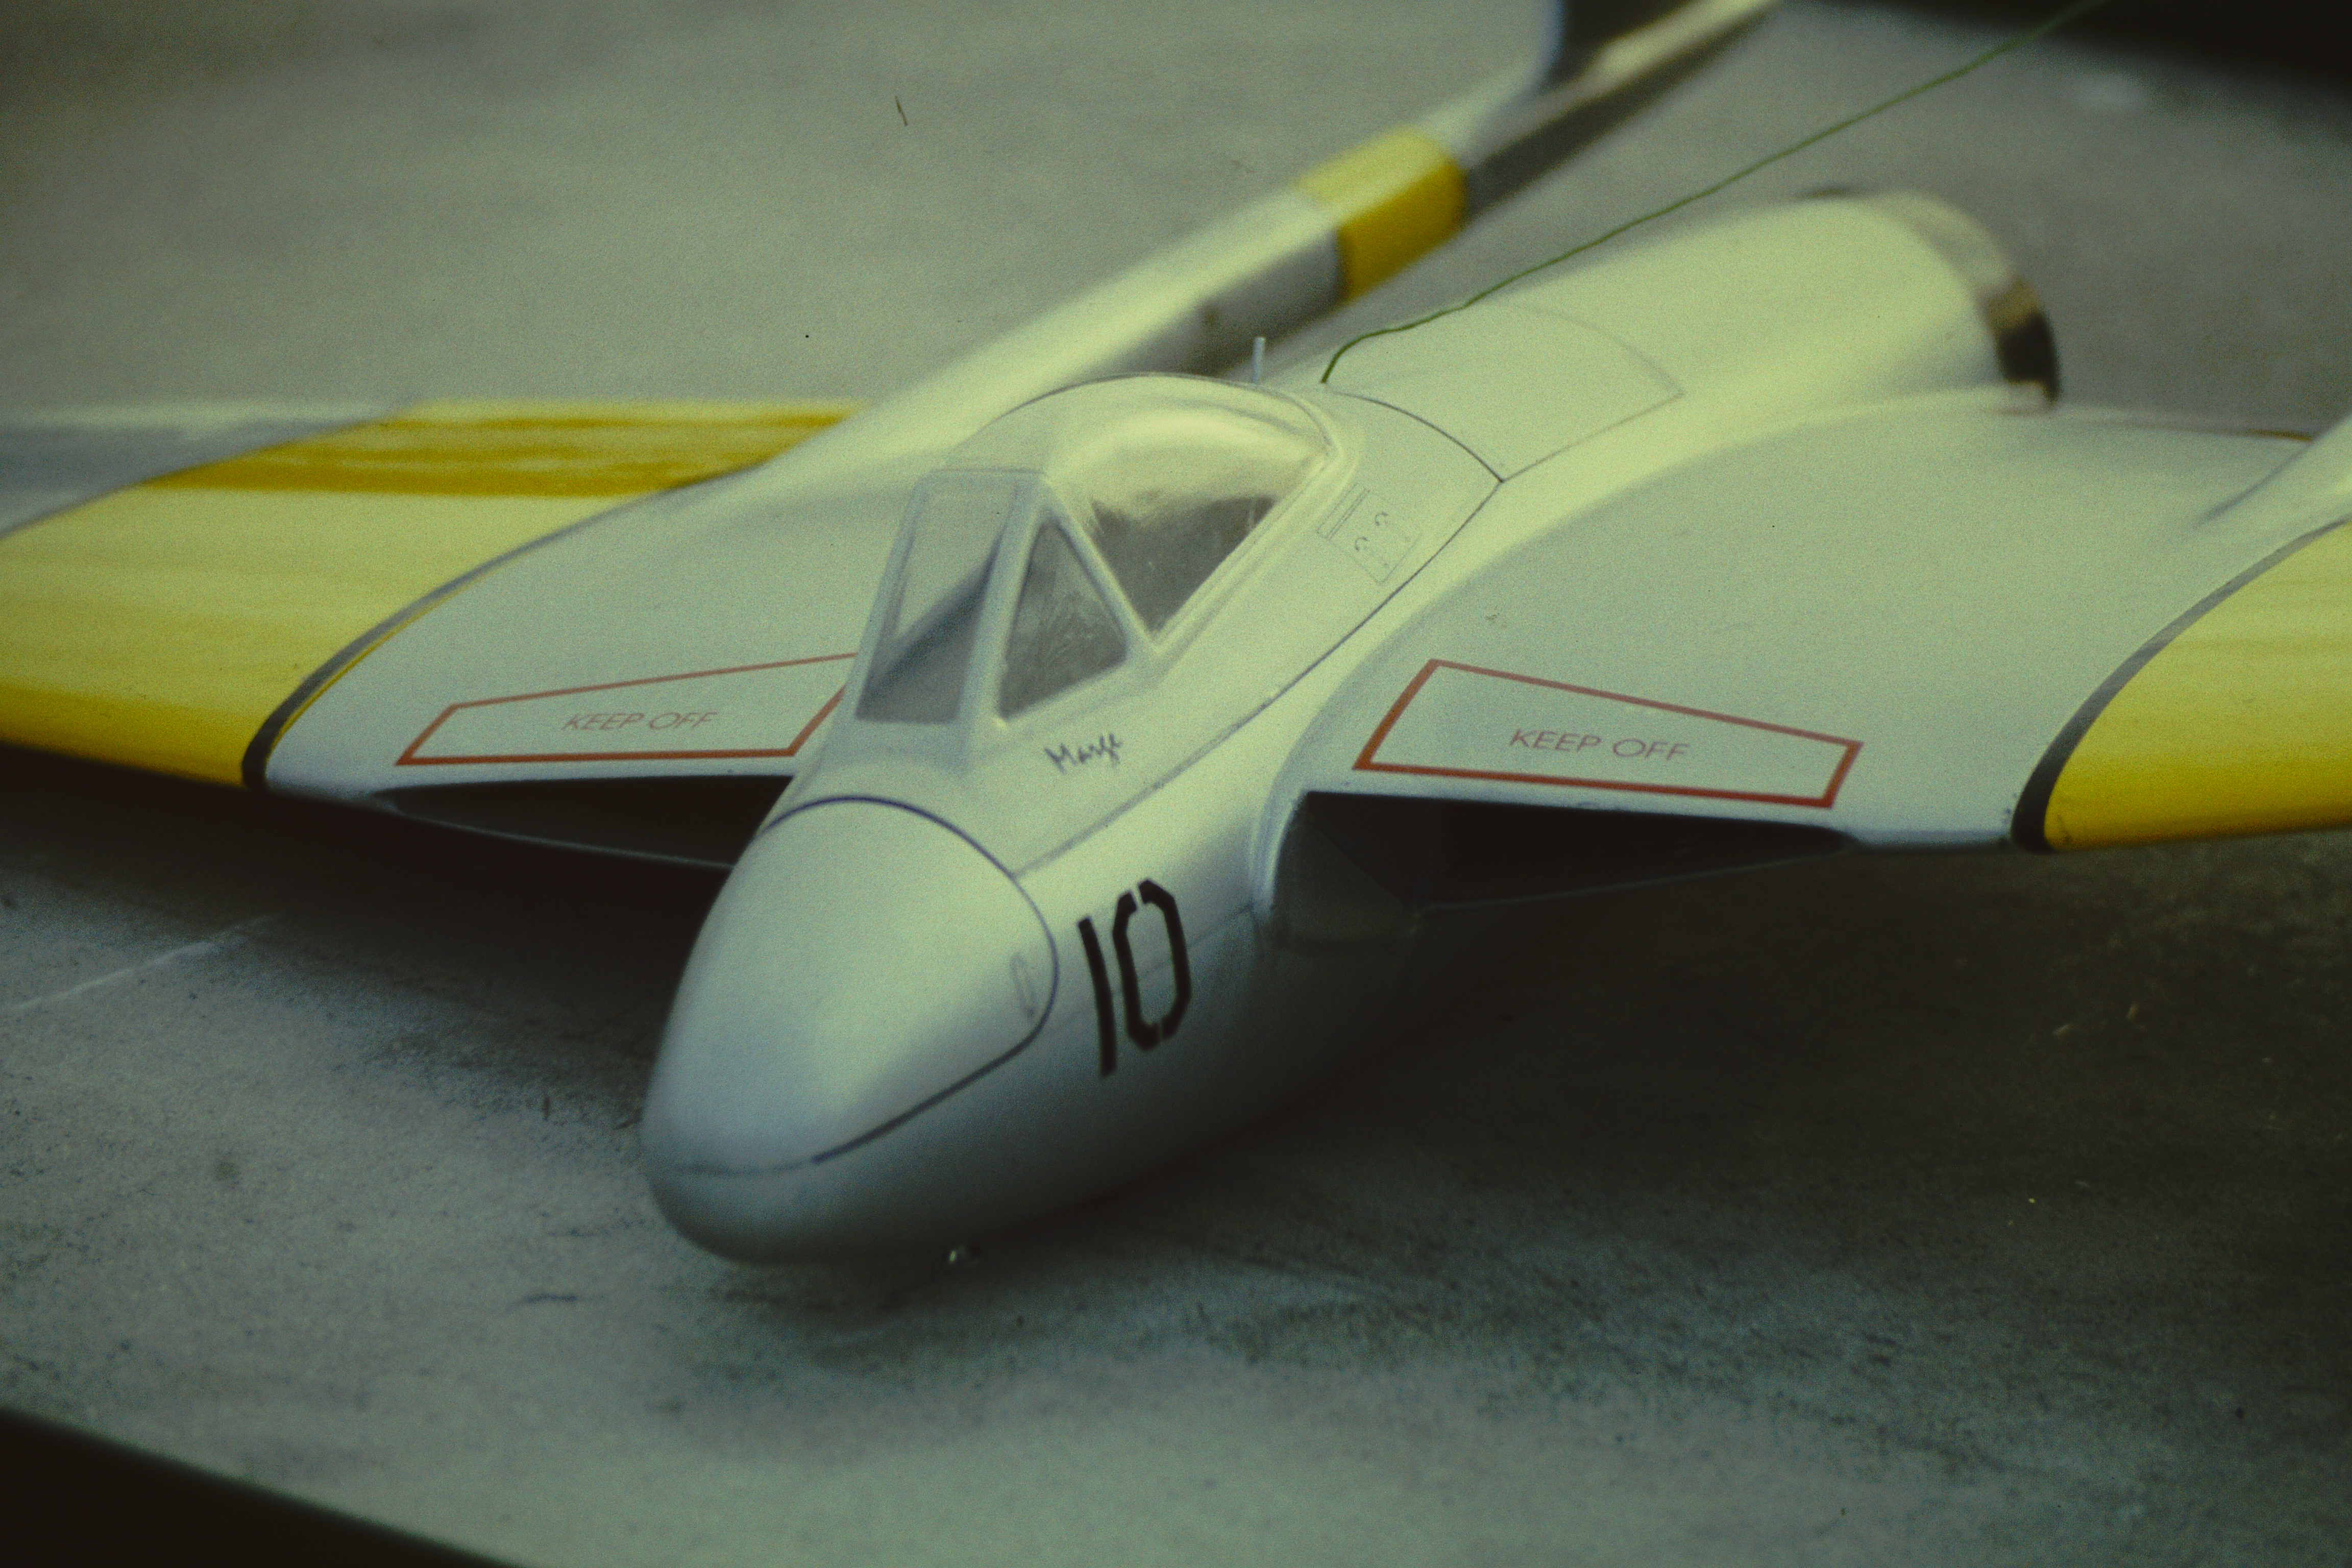 DH Vampire RC-Modell.jpg